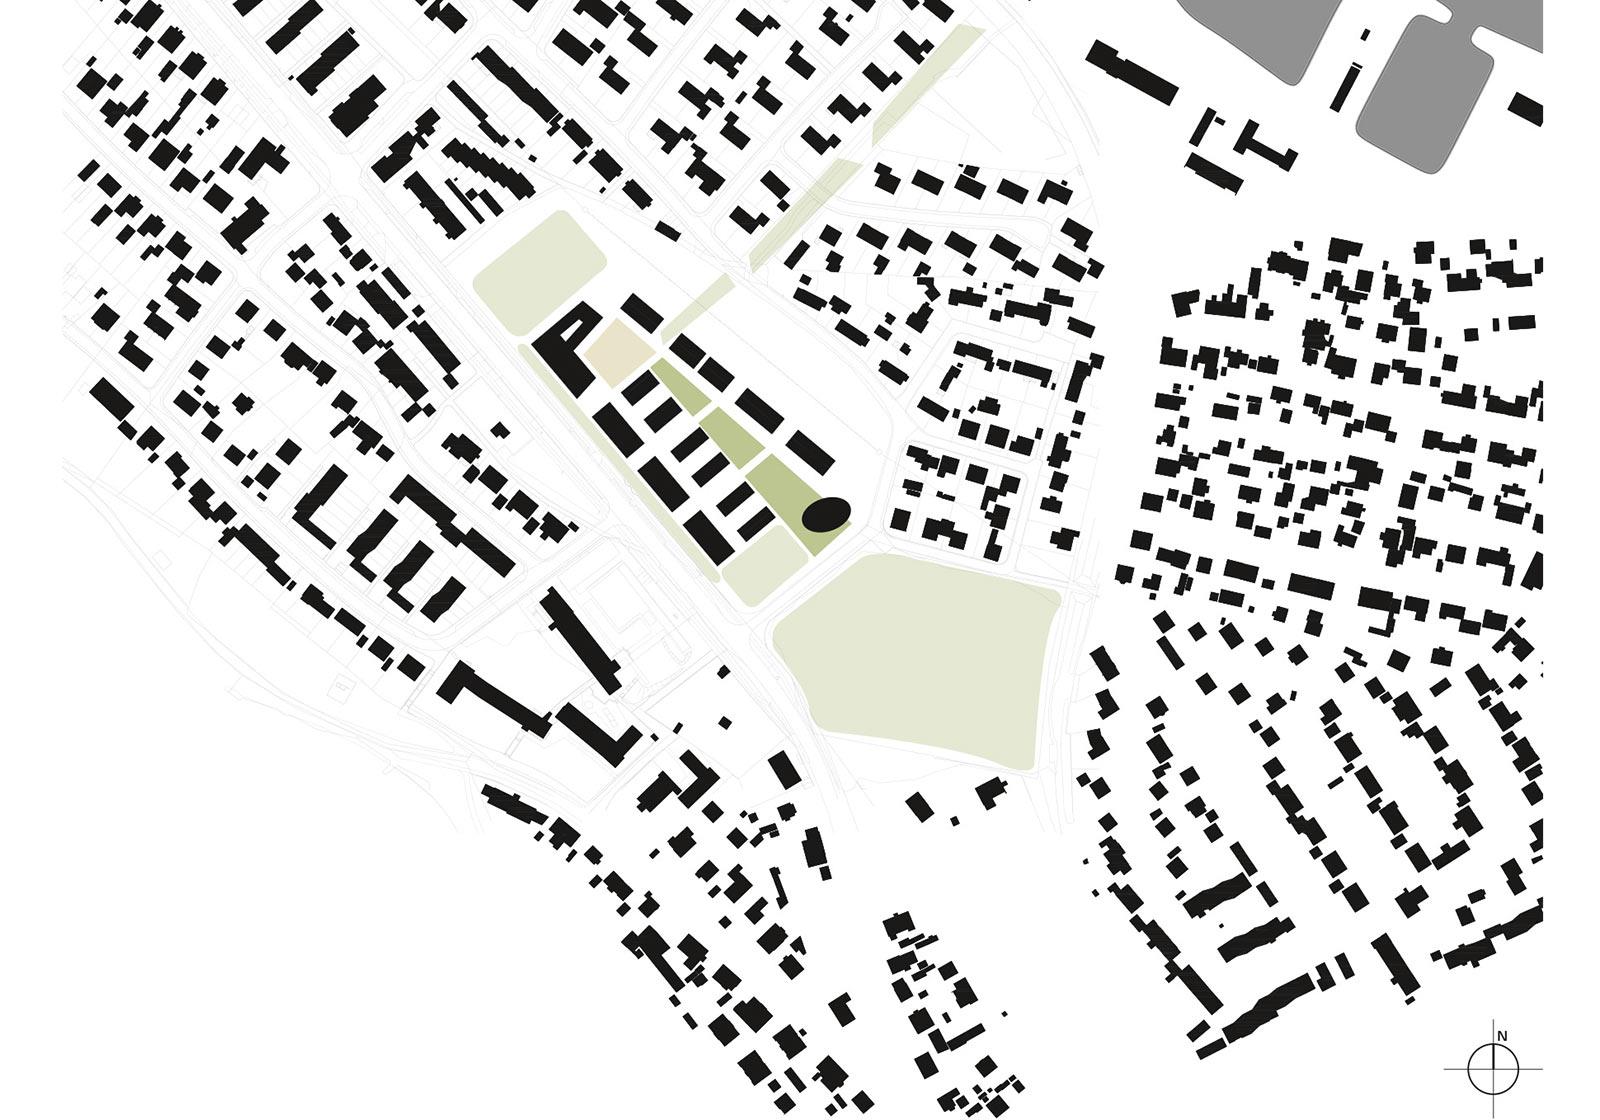 План участка 1:2,000